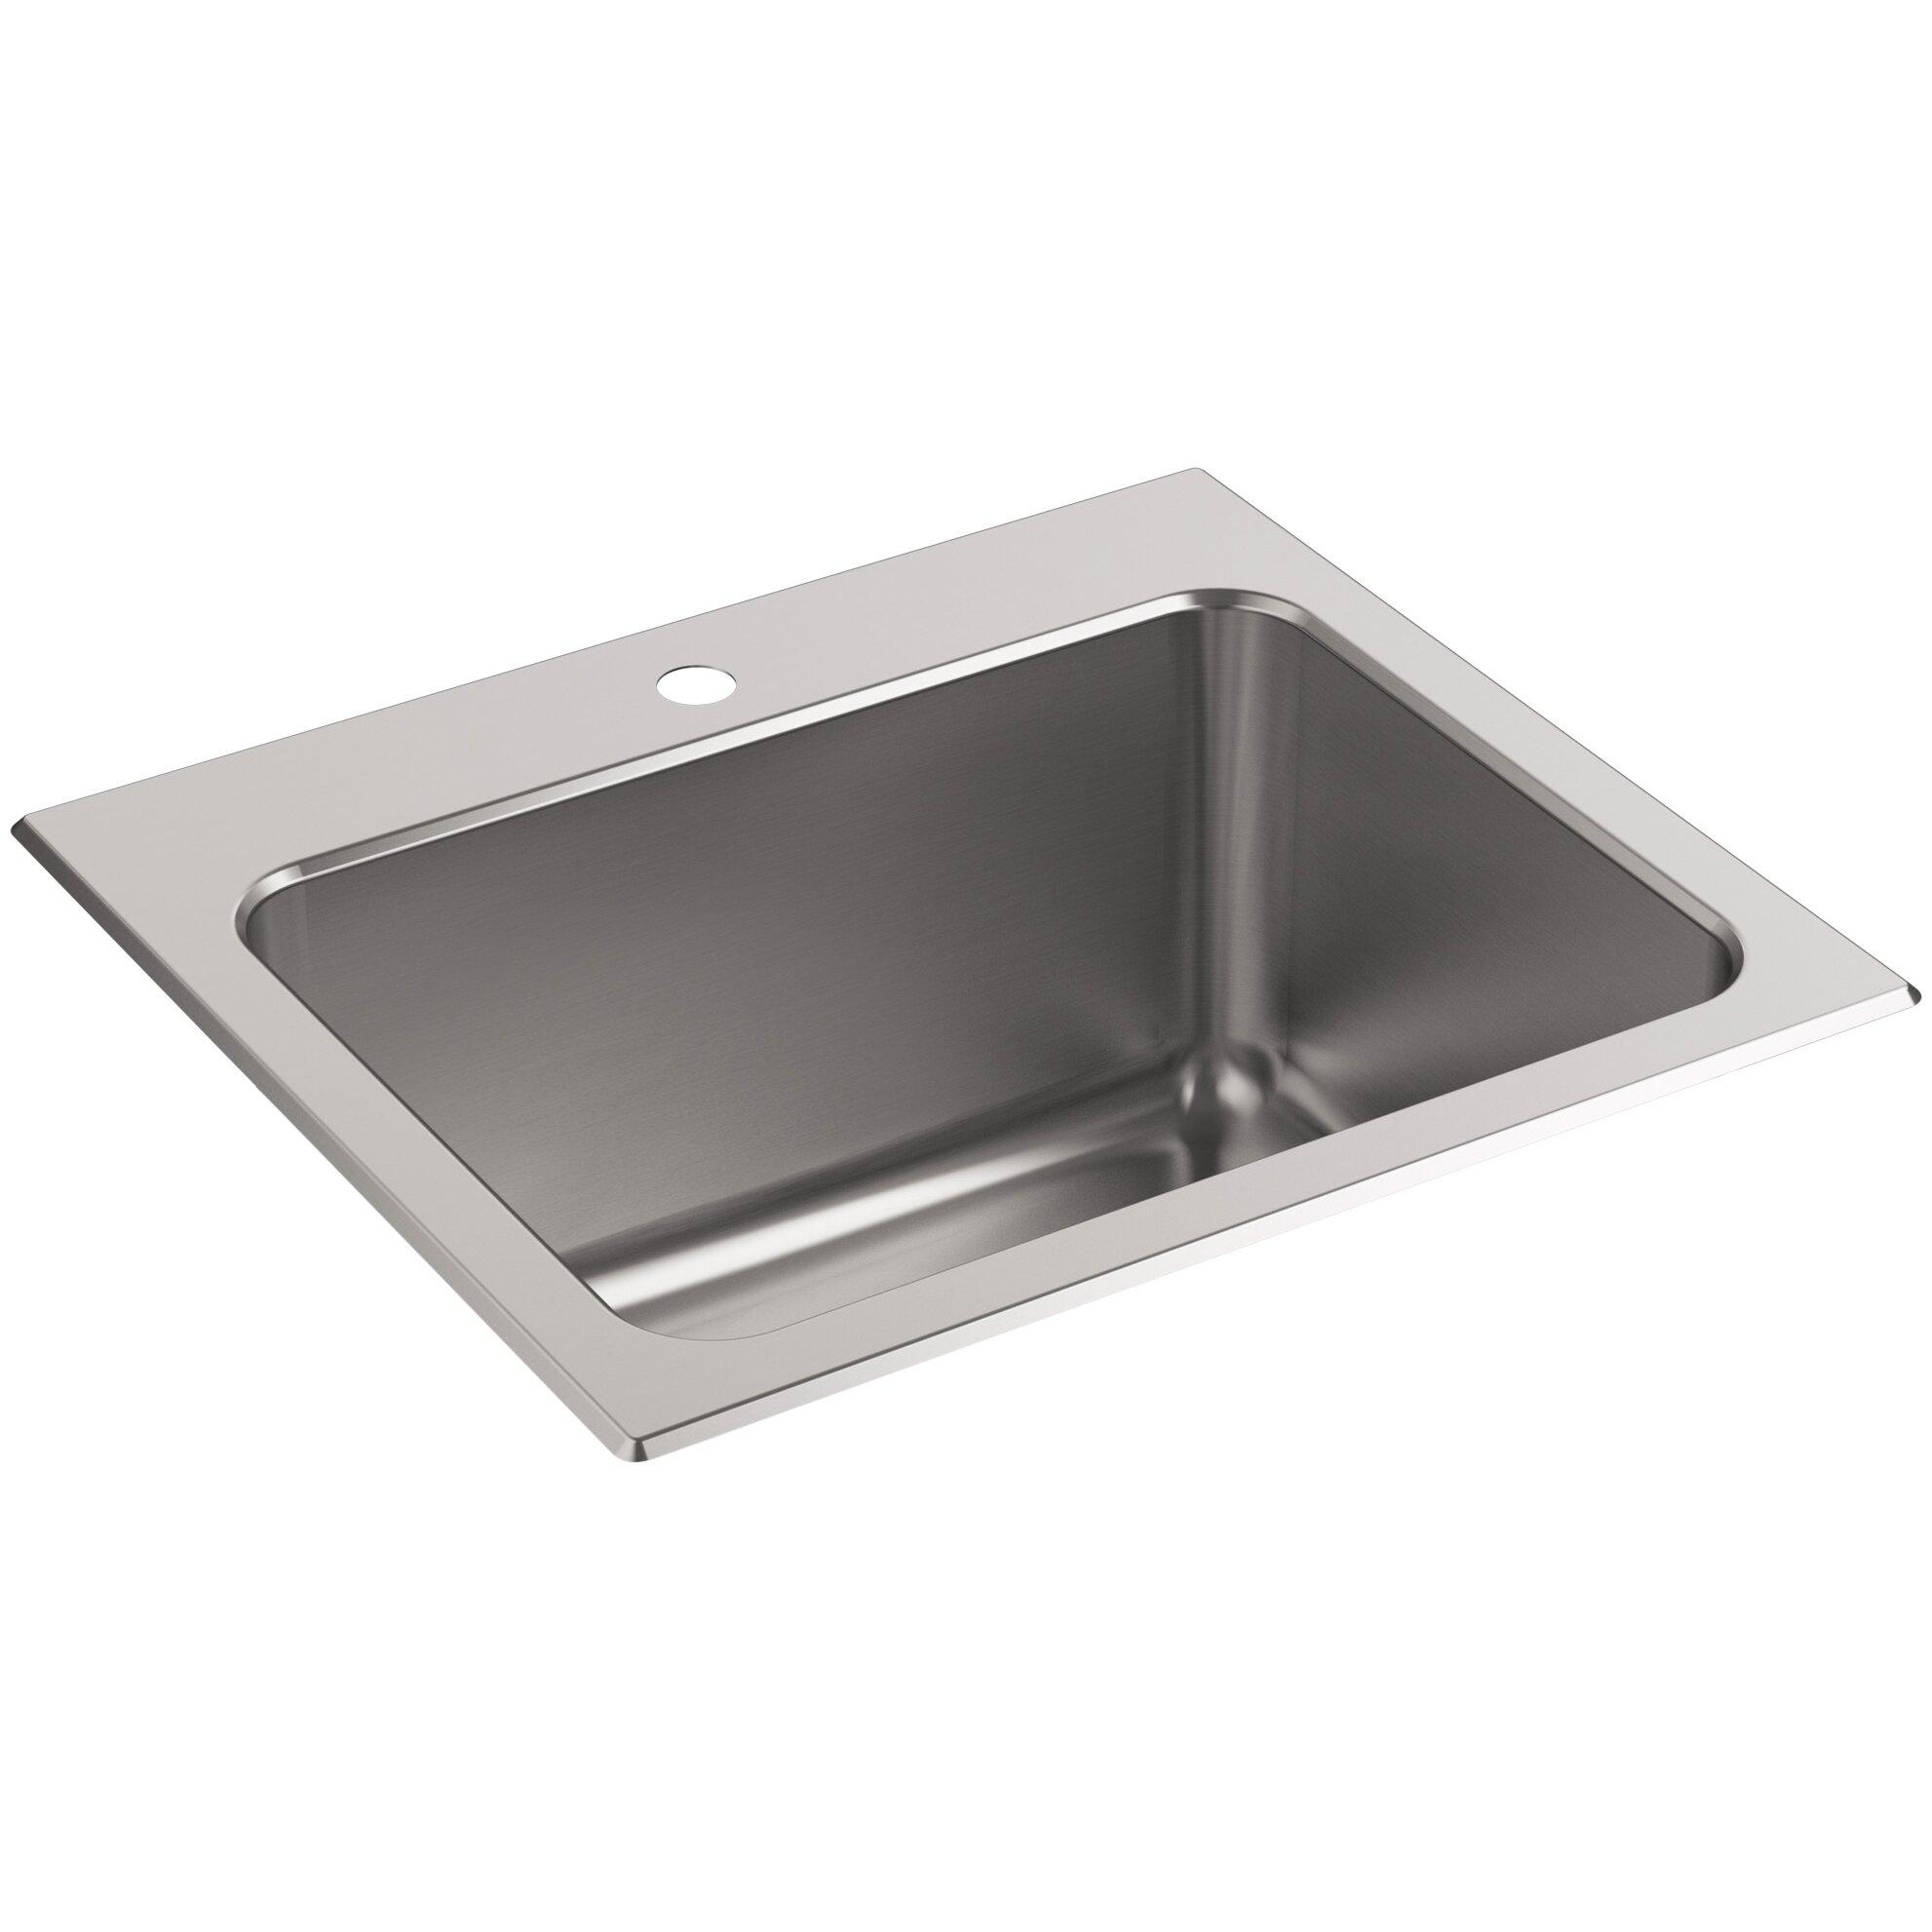 Kohler Ballad Top-Mount Utility Sink with Single Faucet Hole Wayfair